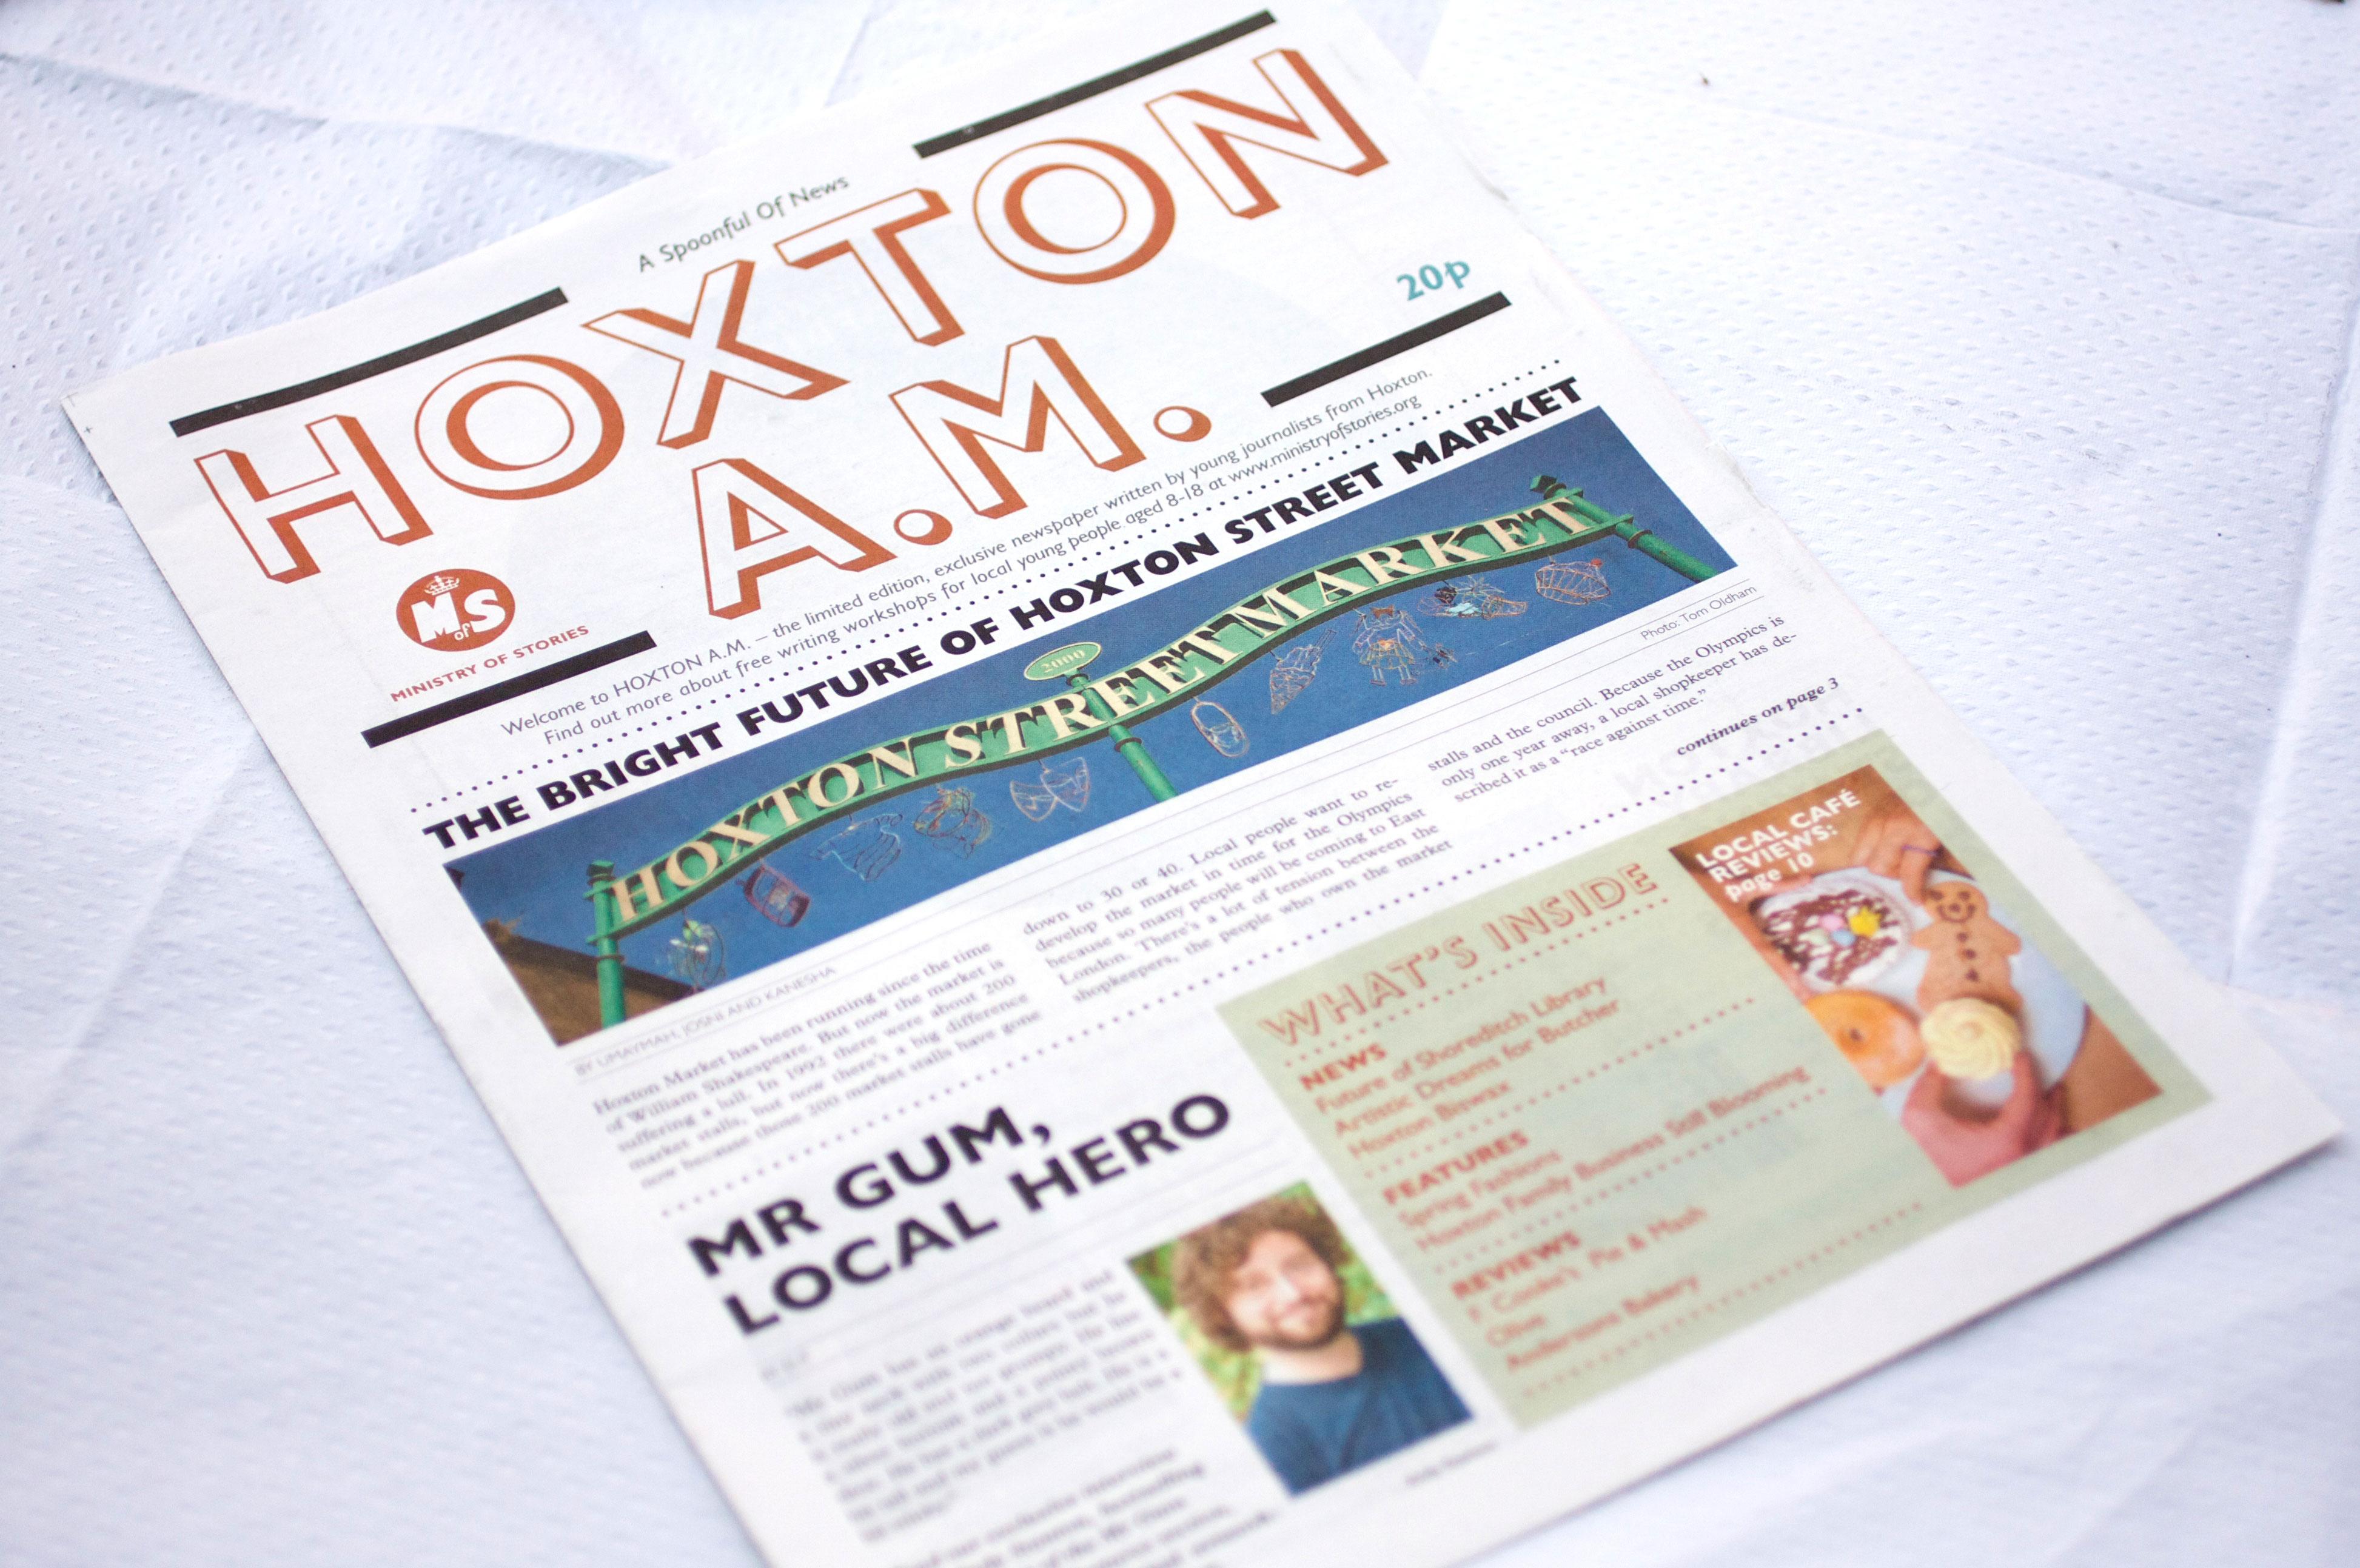 MoS-Hoxton-AM